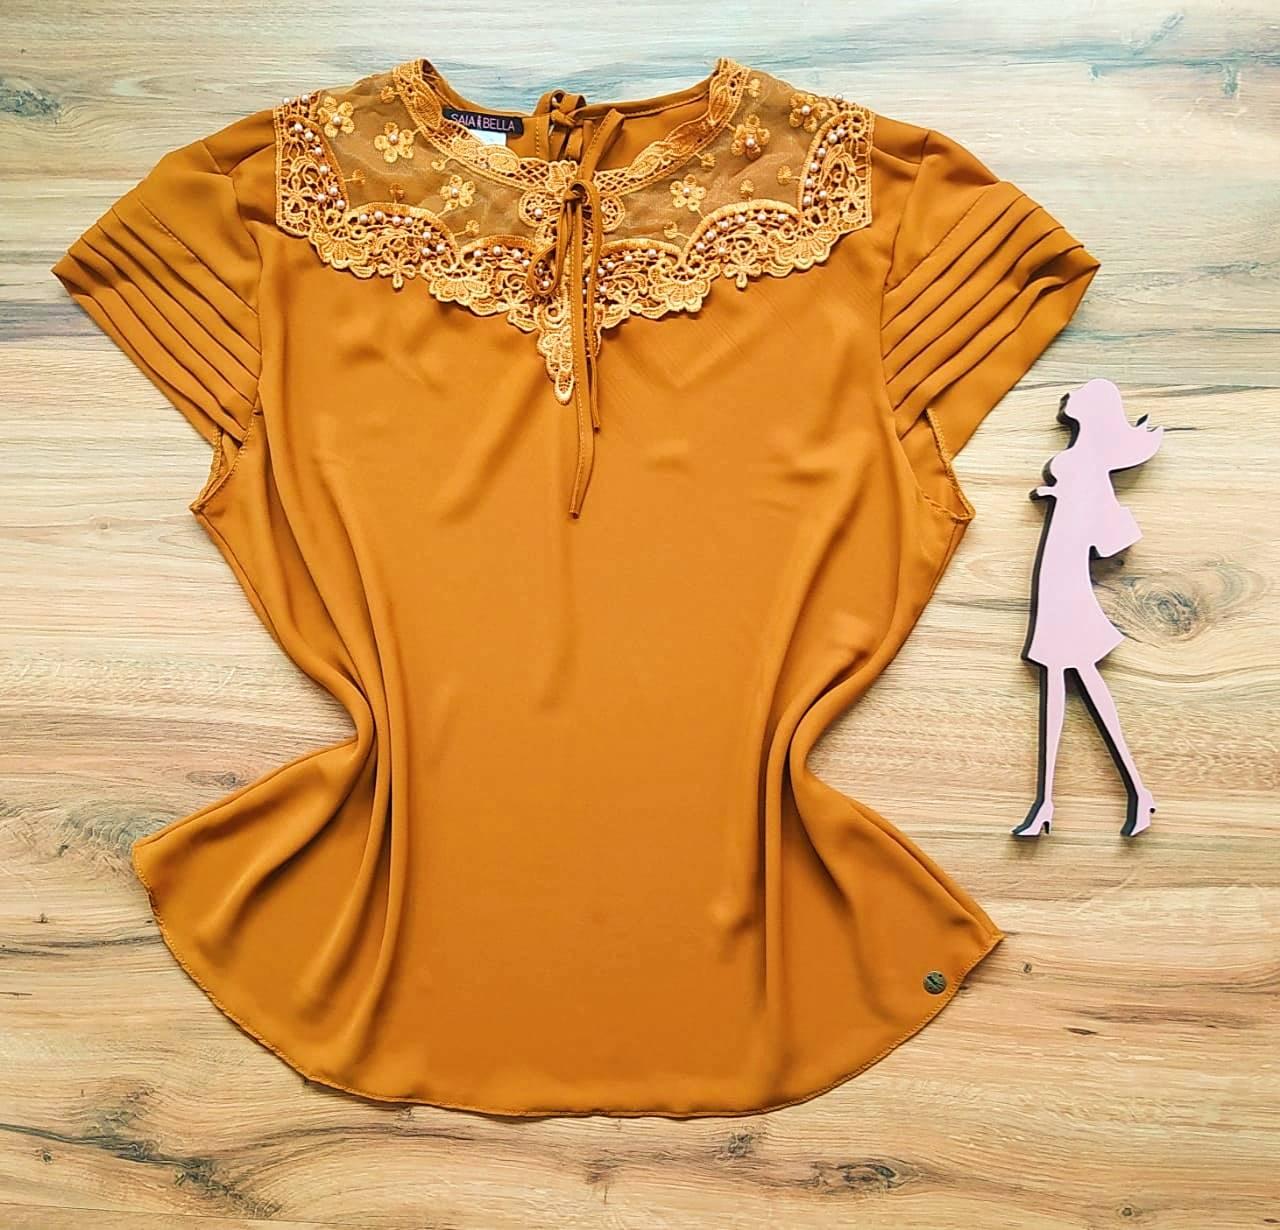 Blusa Nessa de Renda Saia Bella - SB21470 Caramelo Plus Size